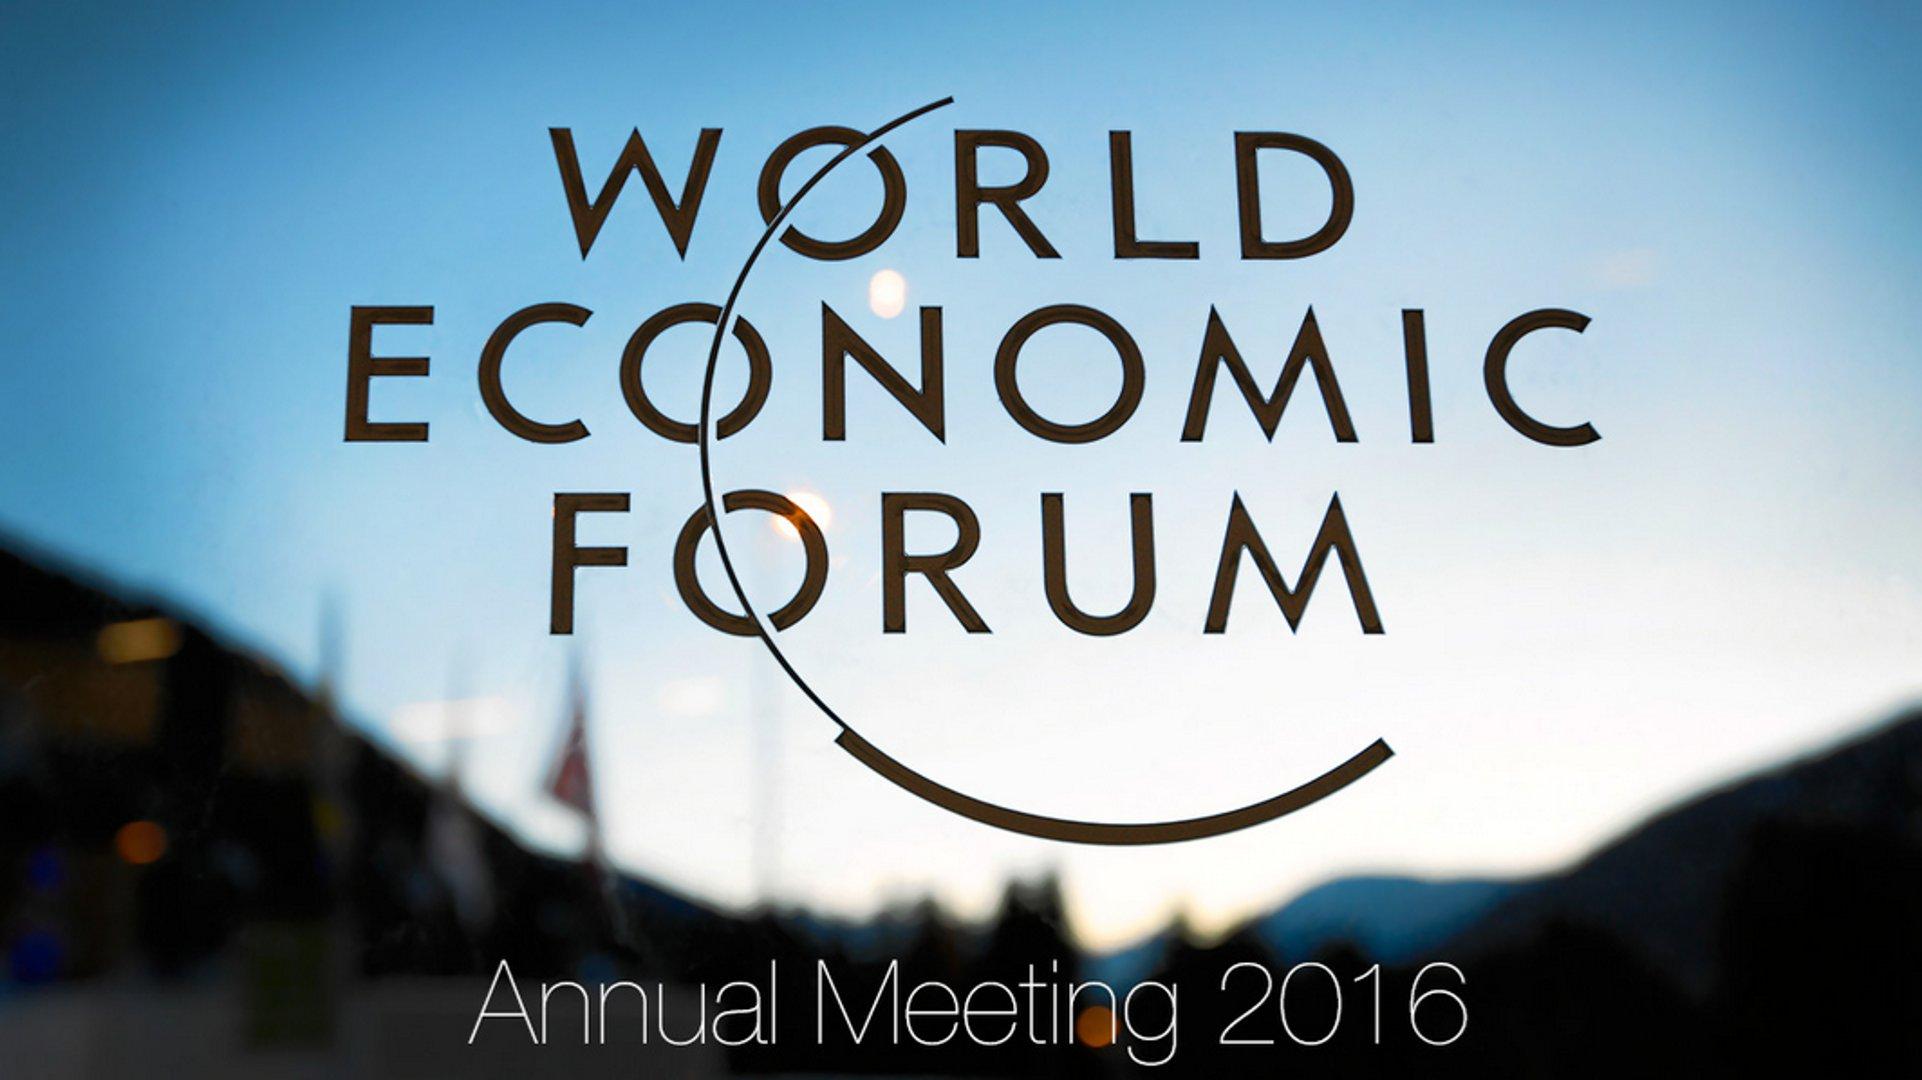 Livestream: World Economic Forum Annual Meeting 2016 (video)